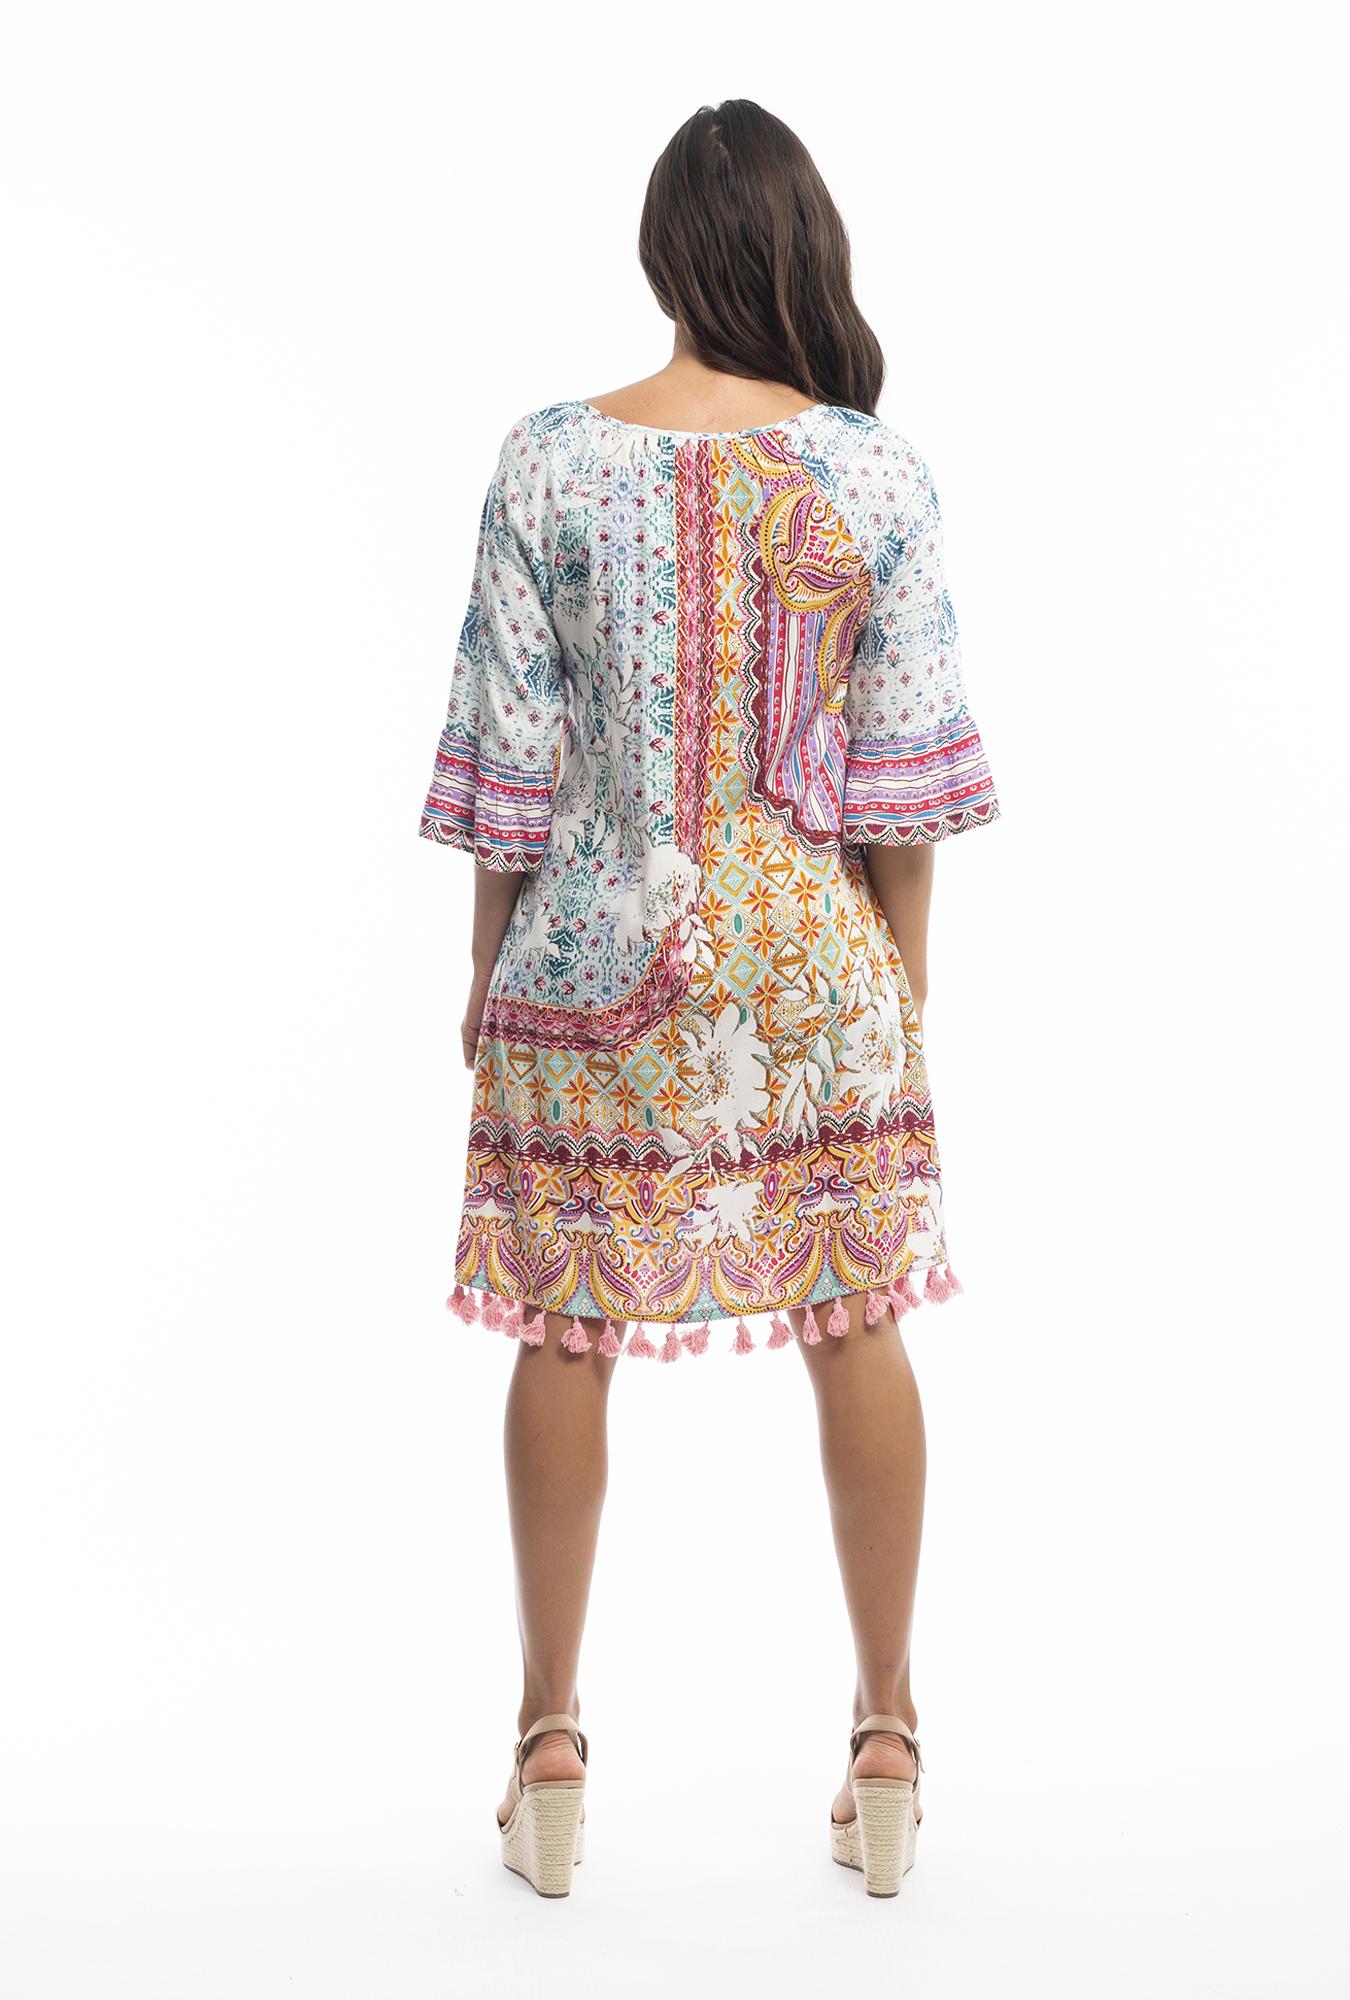 Marie Dress in Chateau Usse Dress